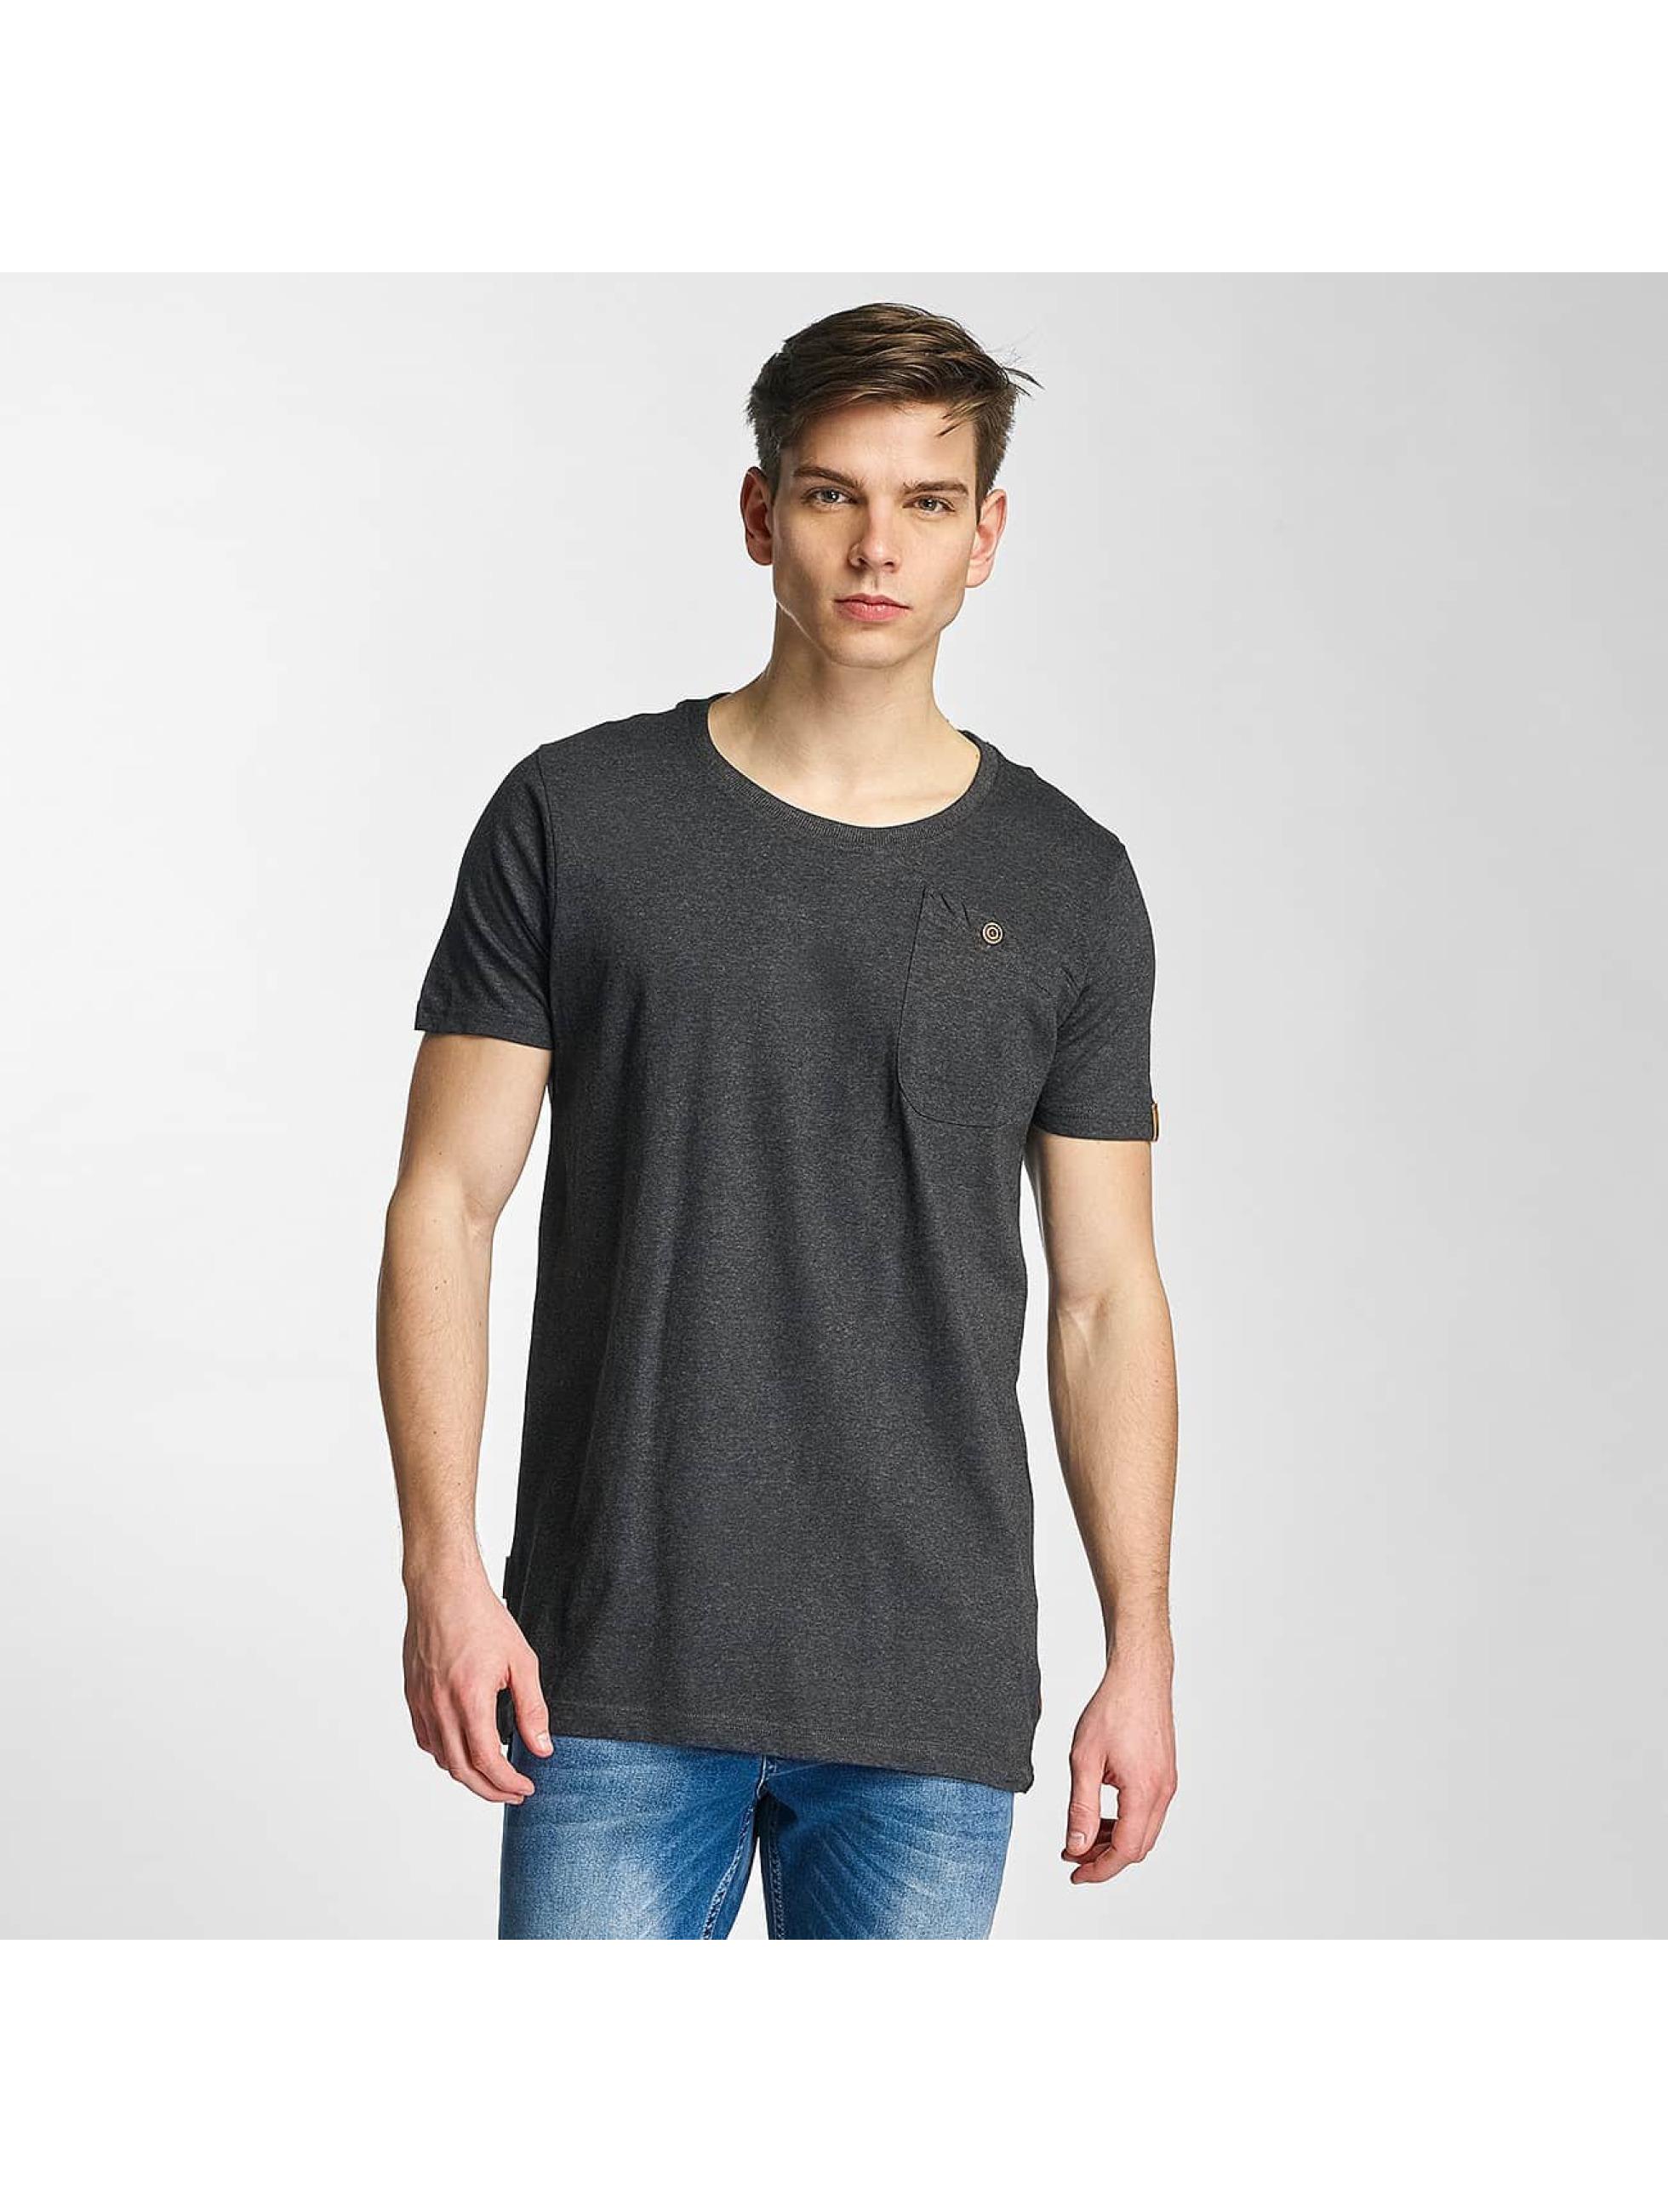 Alife-amp-Kickin-Uomini-Maglieria-T-shirt-Maddox